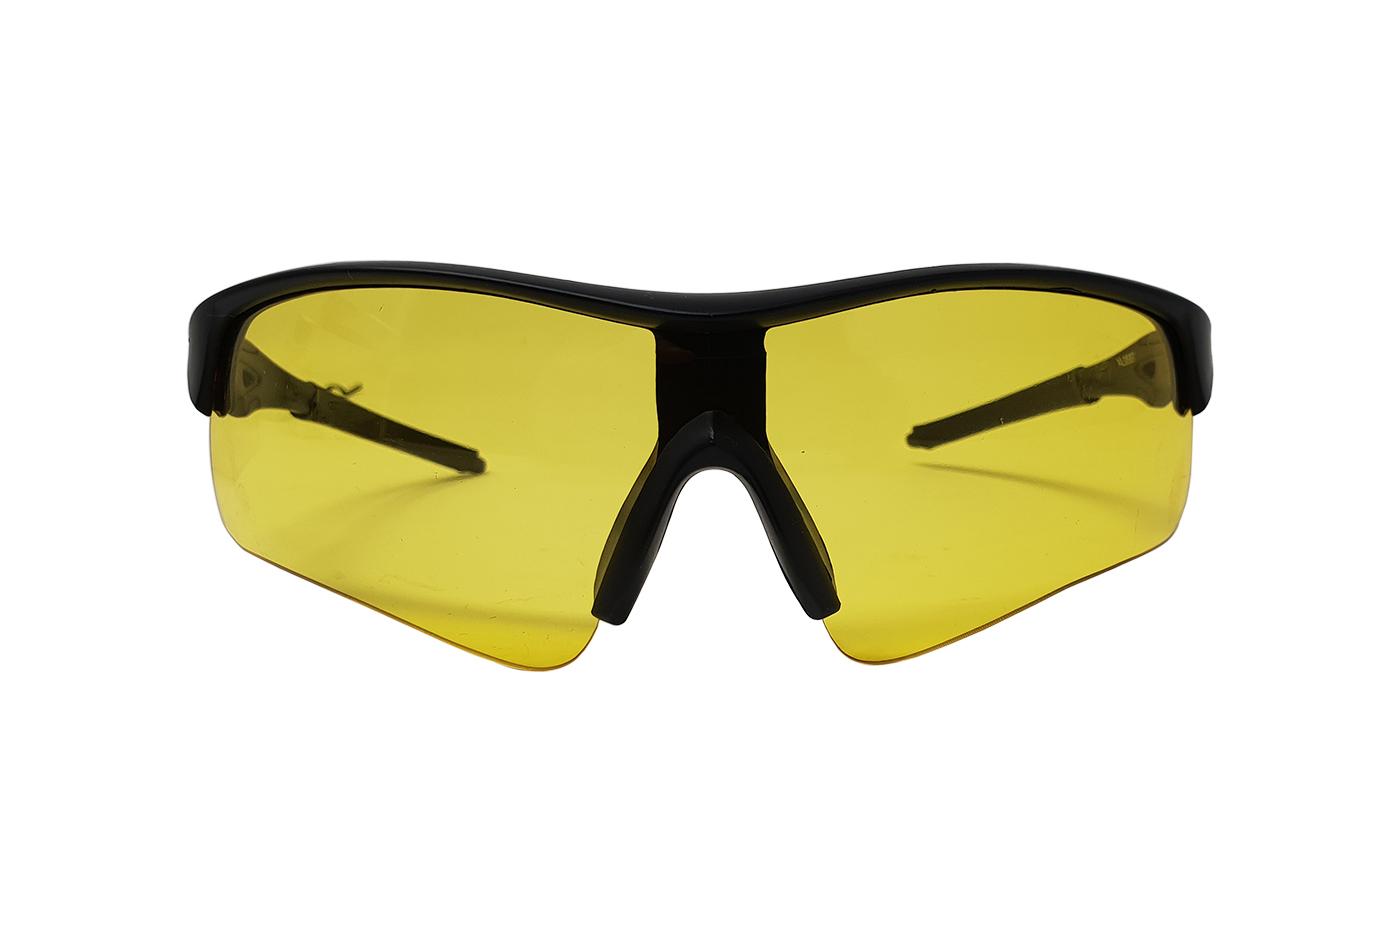 Bes utensili manuali beselettronica occhiali da guida